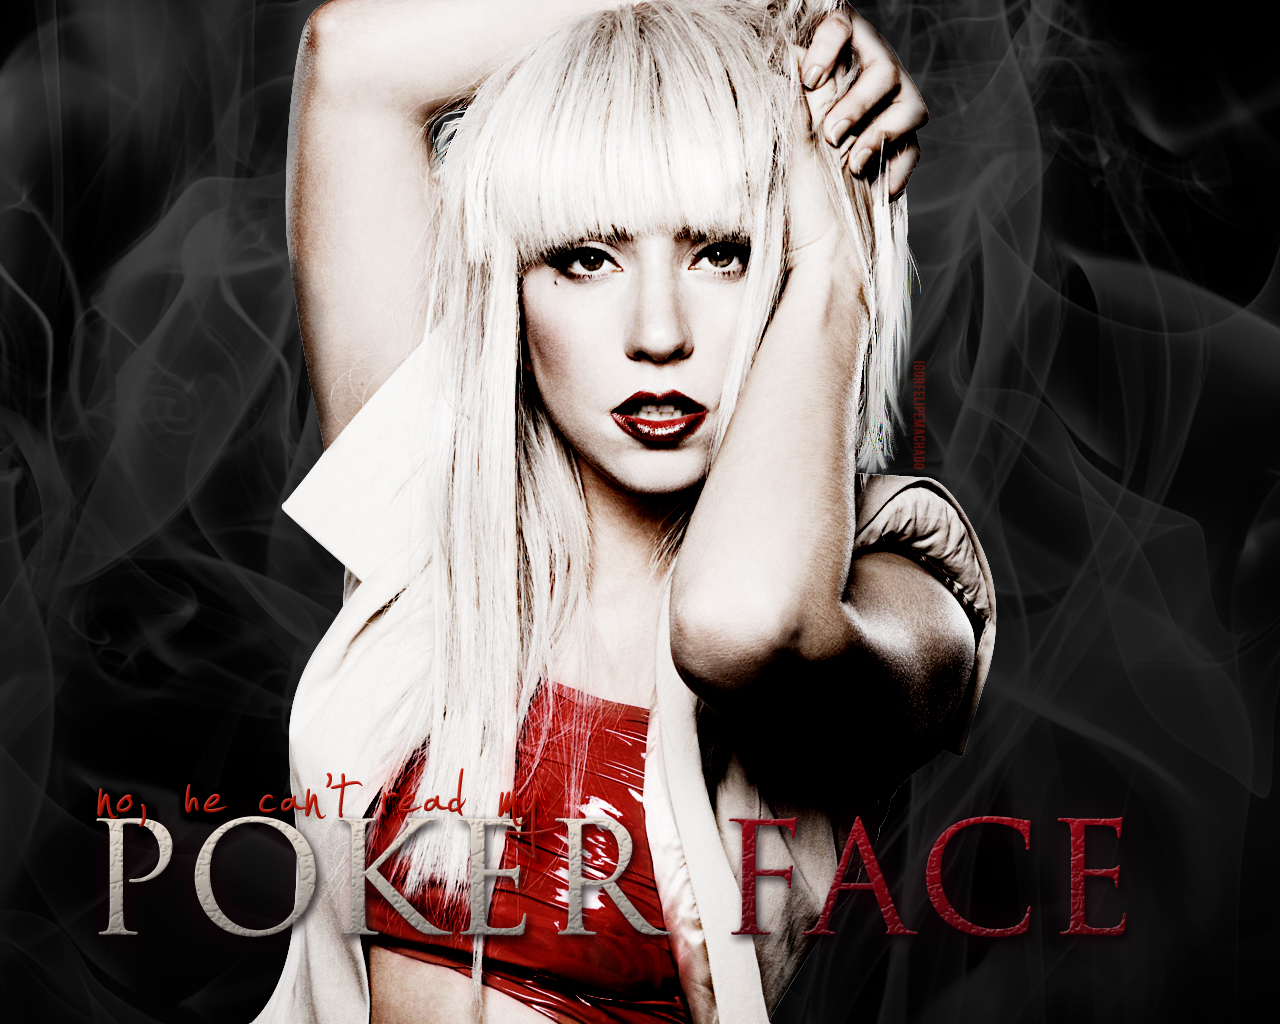 http://1.bp.blogspot.com/-VFxq74eFmX0/Tbz20sPrHLI/AAAAAAAAB0U/9nmEqBWBDO8/s1600/Lady-Gaga-Wallpaper-001.jpg